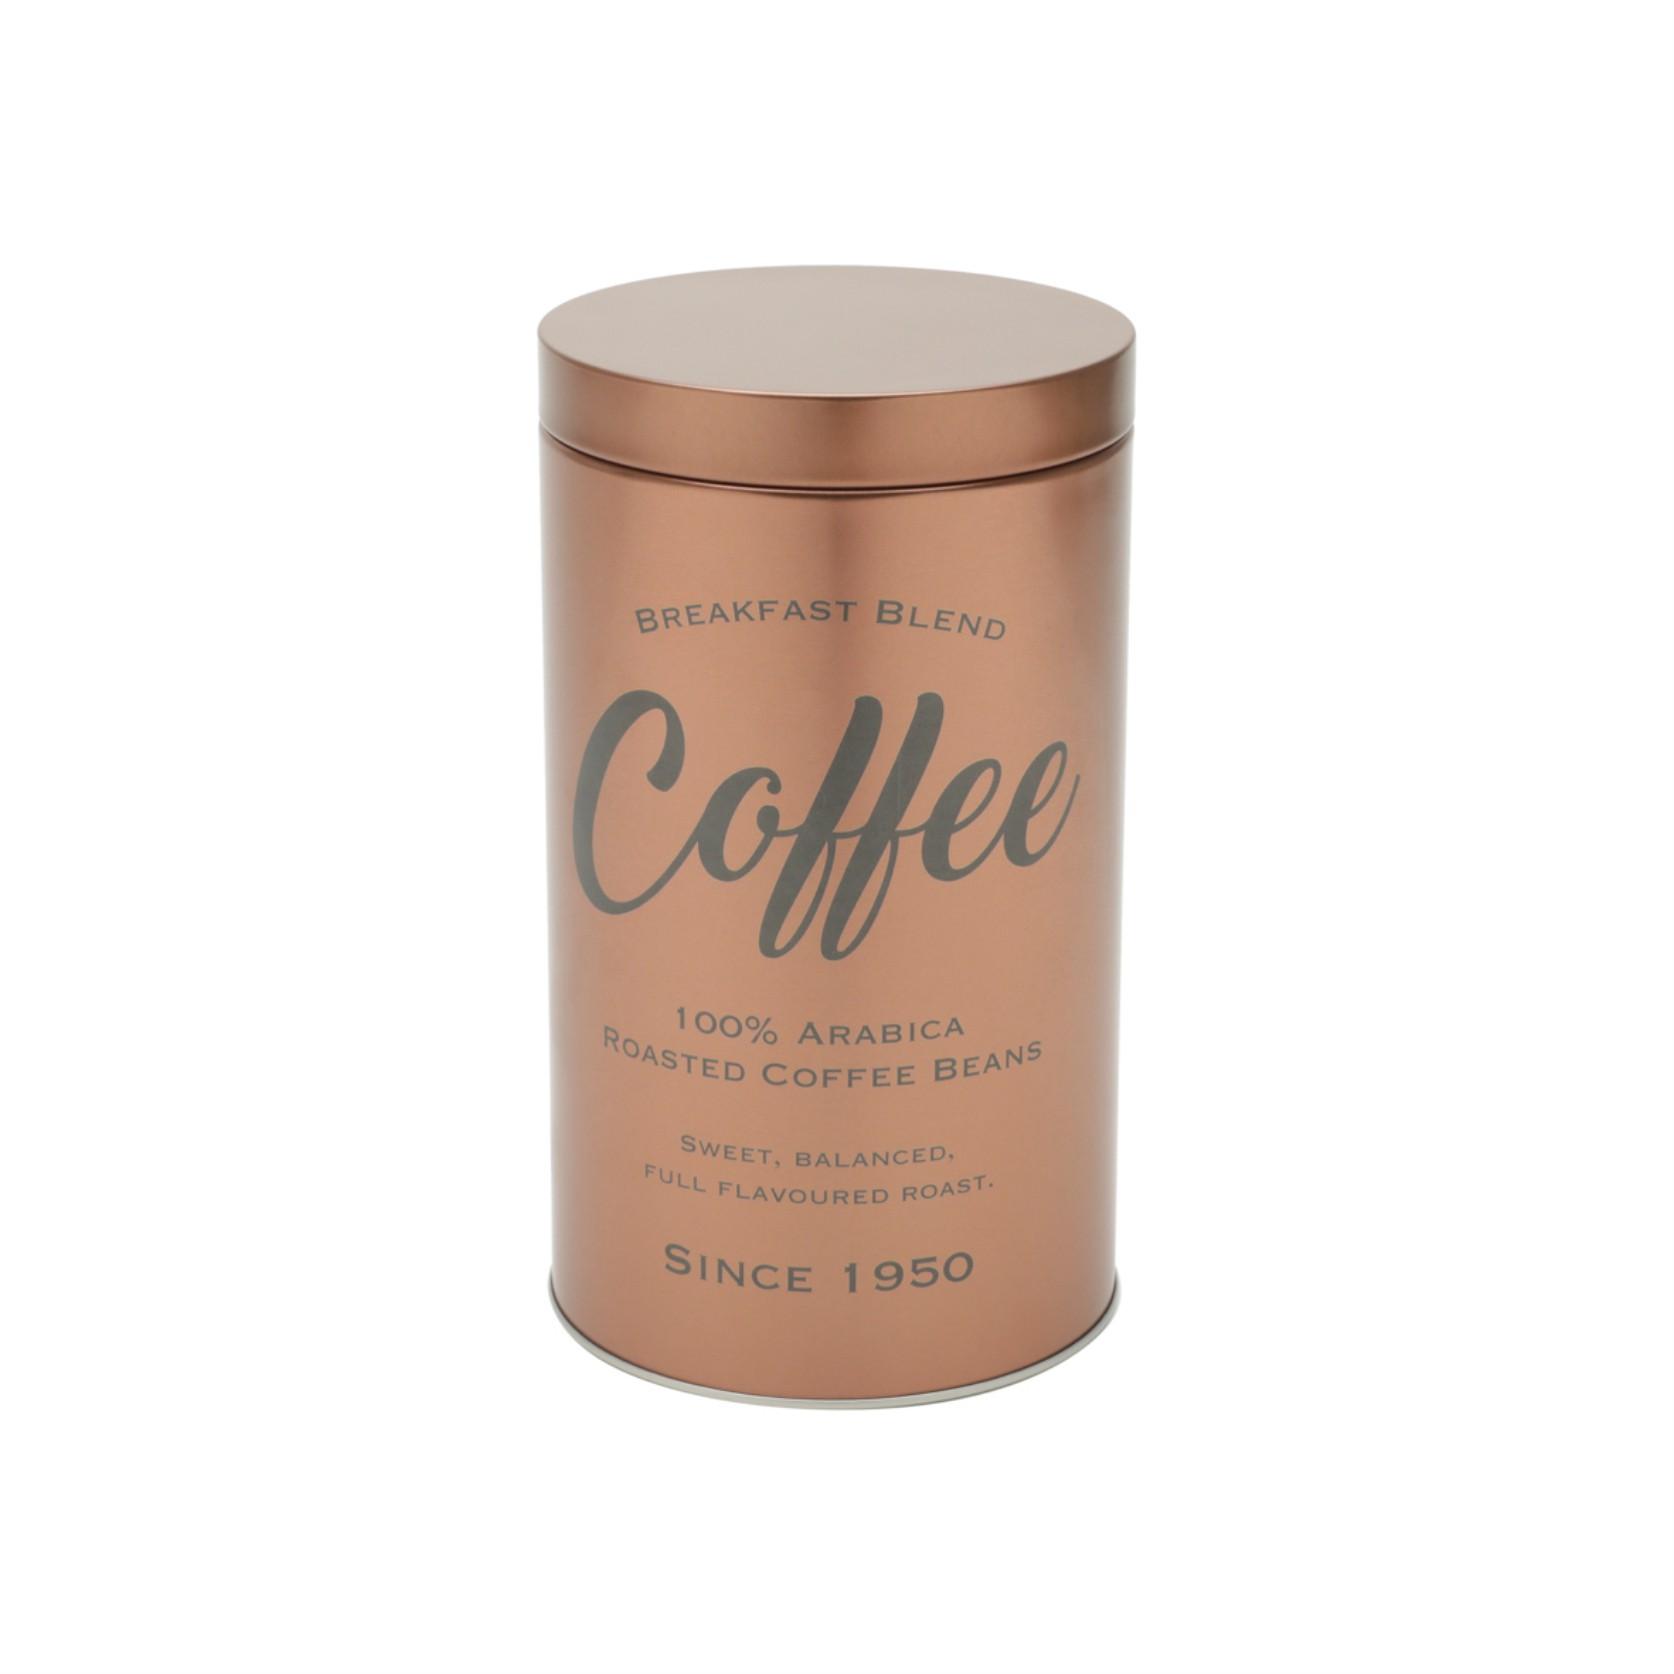 LATA METAL EXPRESSO ROUND COFFEE BEANS COBRE 10,8X18,8CM - URBAN 42913